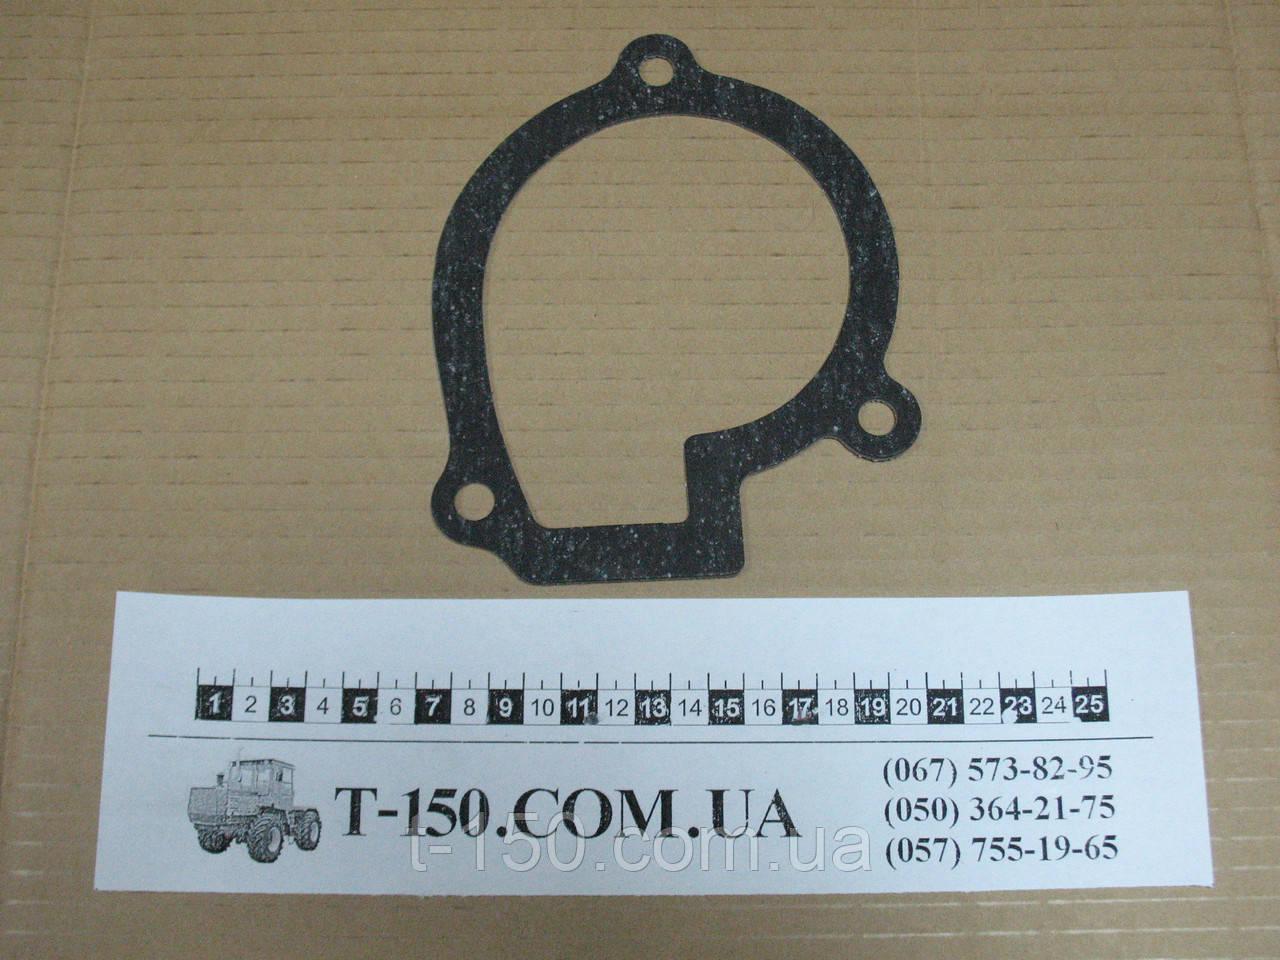 Прокладка водяного насоса Д-240 МТЗ паронит 1,5мм (50-1307048-Б)